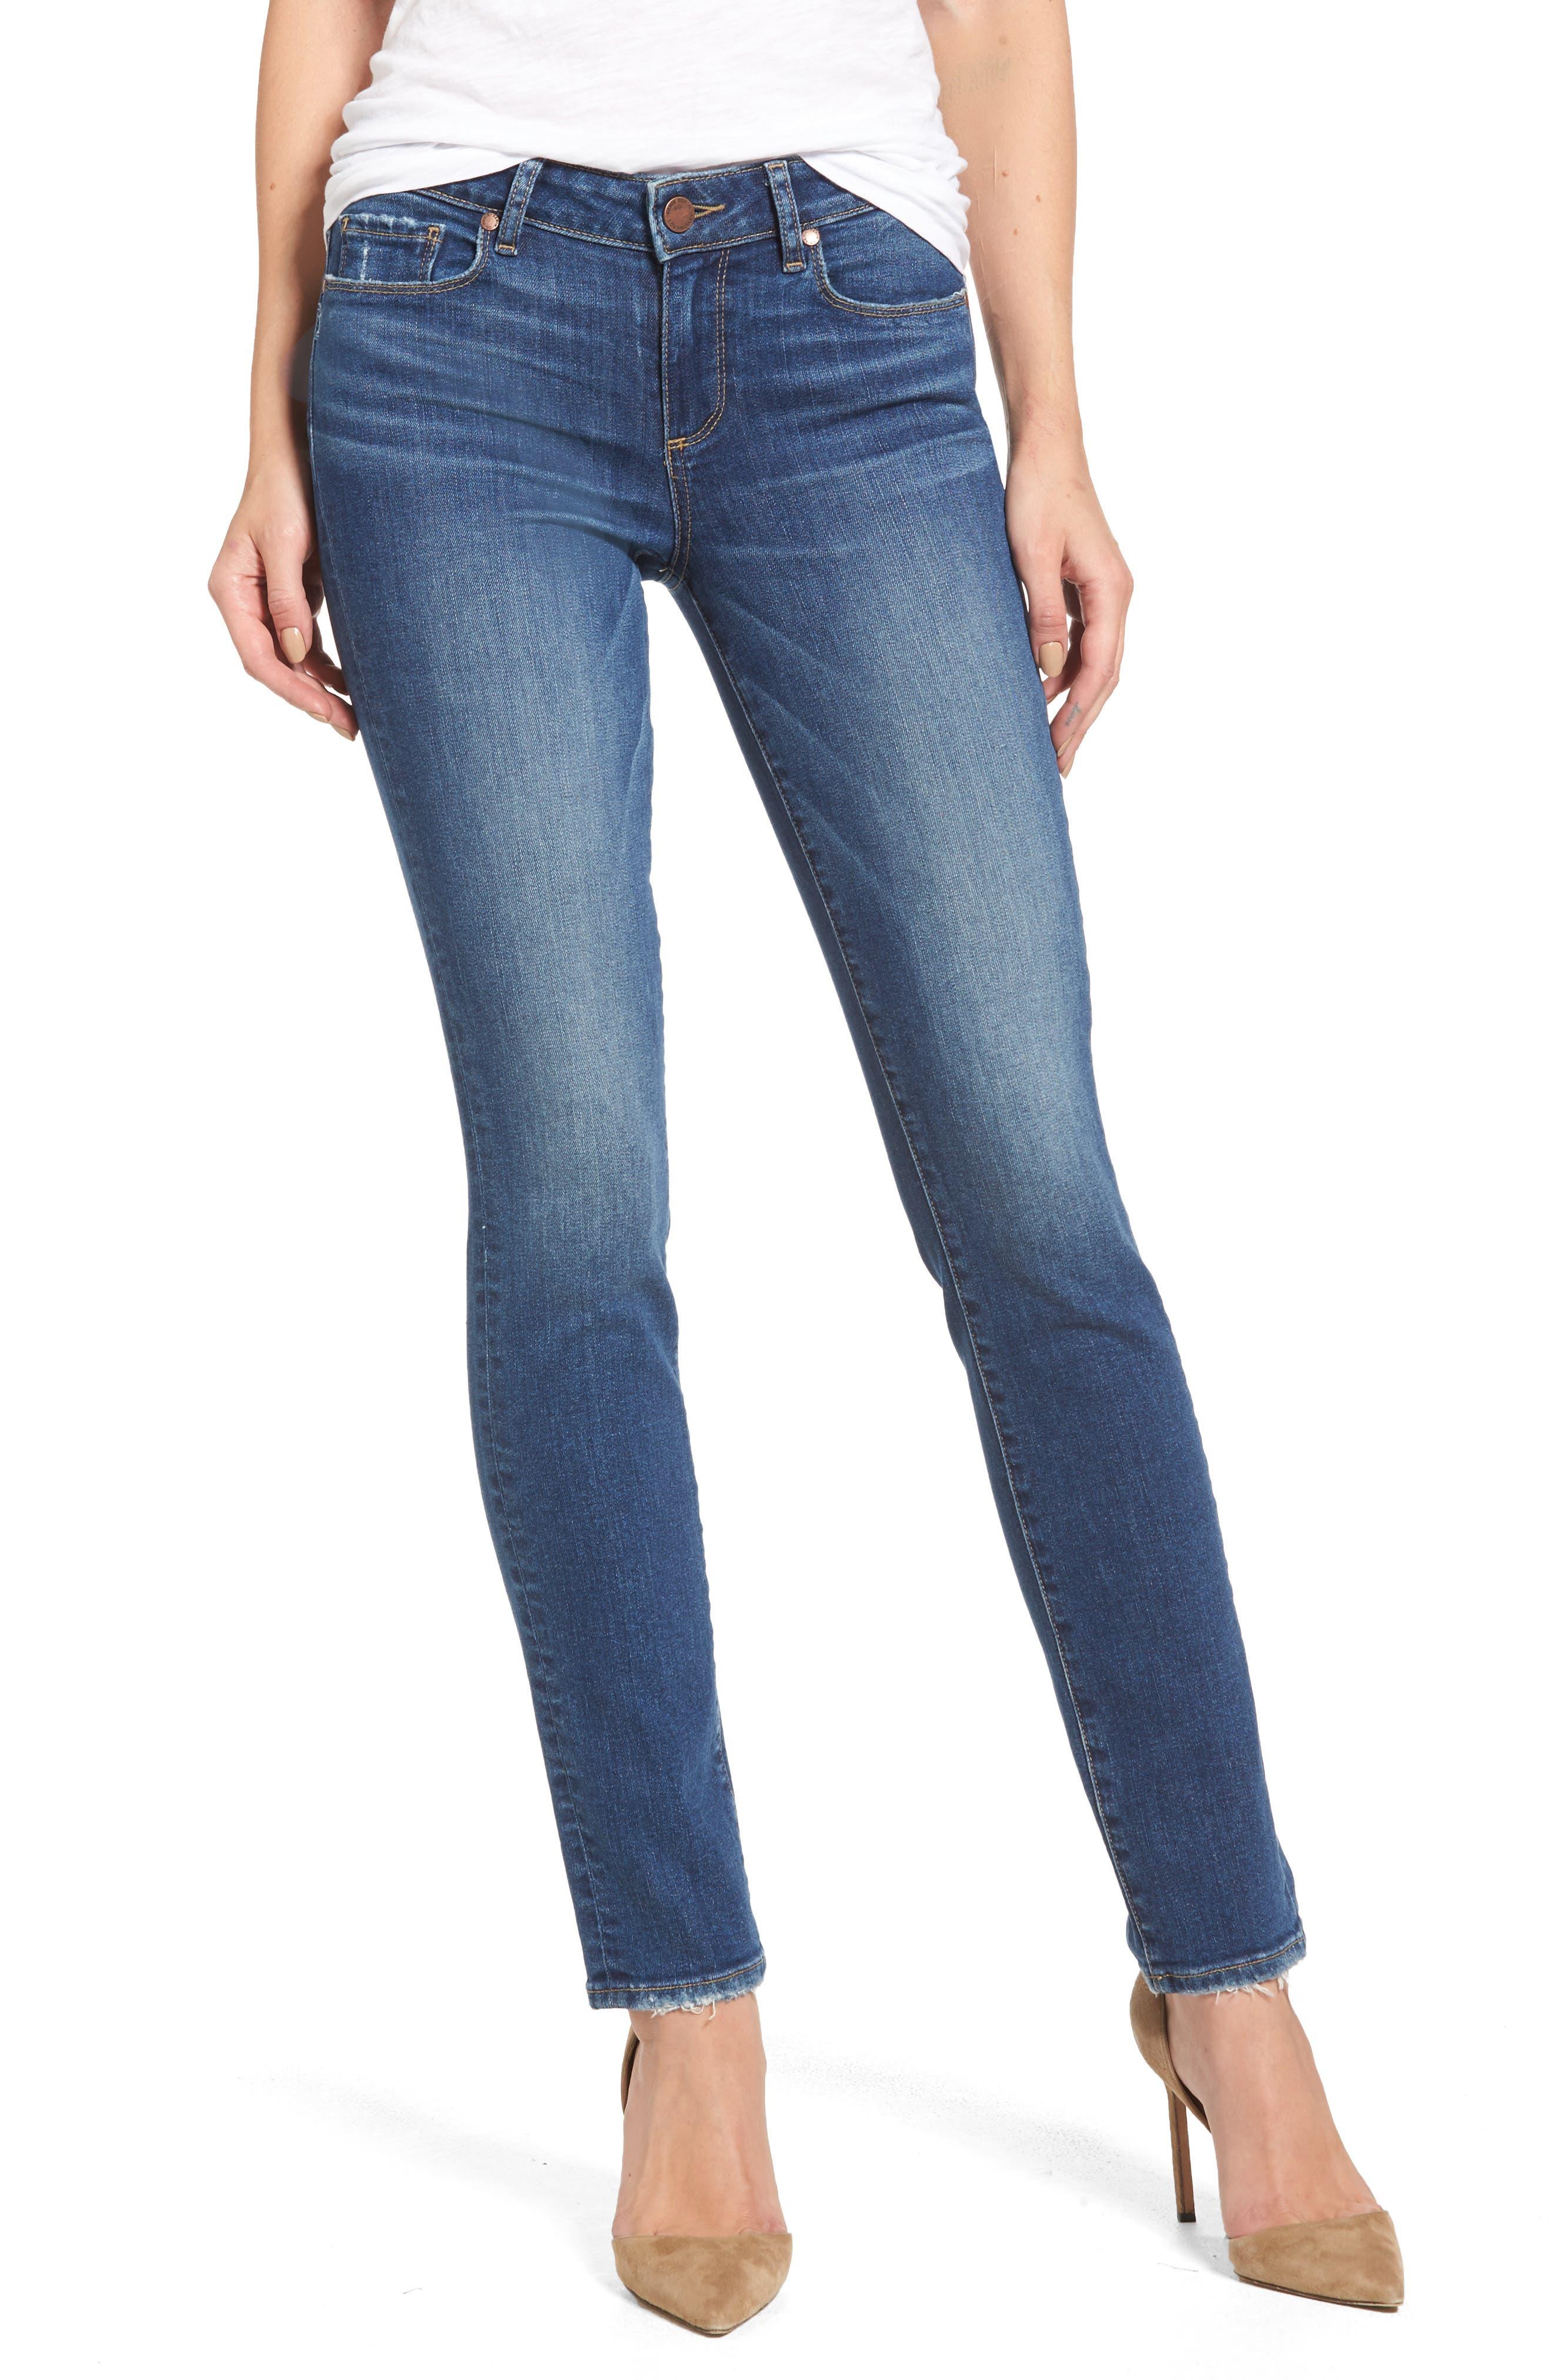 Skyline Skinny Jeans,                             Main thumbnail 1, color,                             400